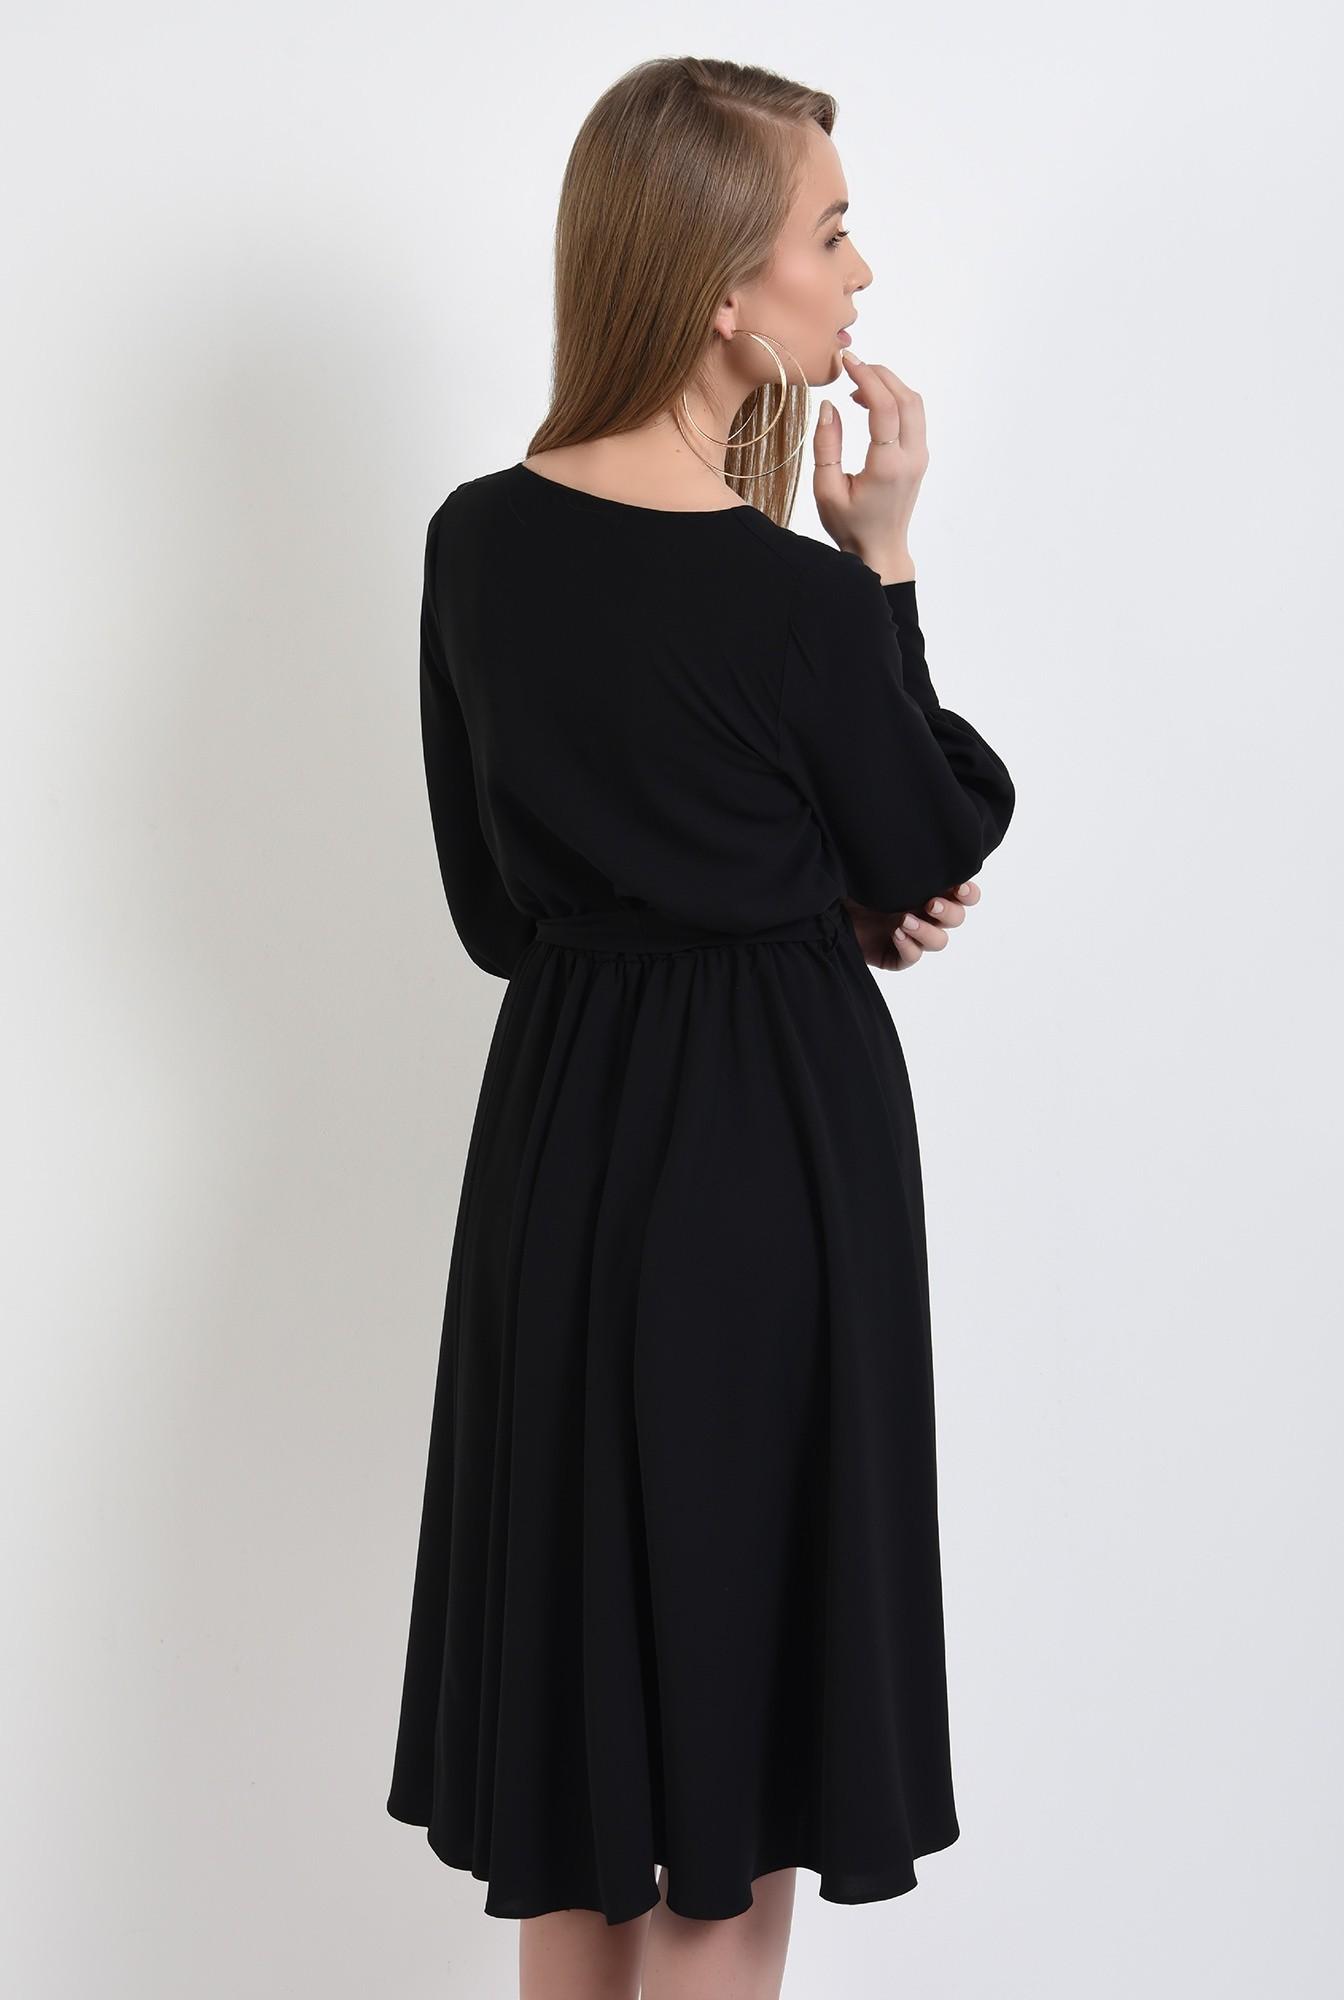 1 - rochie neagra, cu anchior petrecut, midi, evazata, cu cordon, rochie de primavara